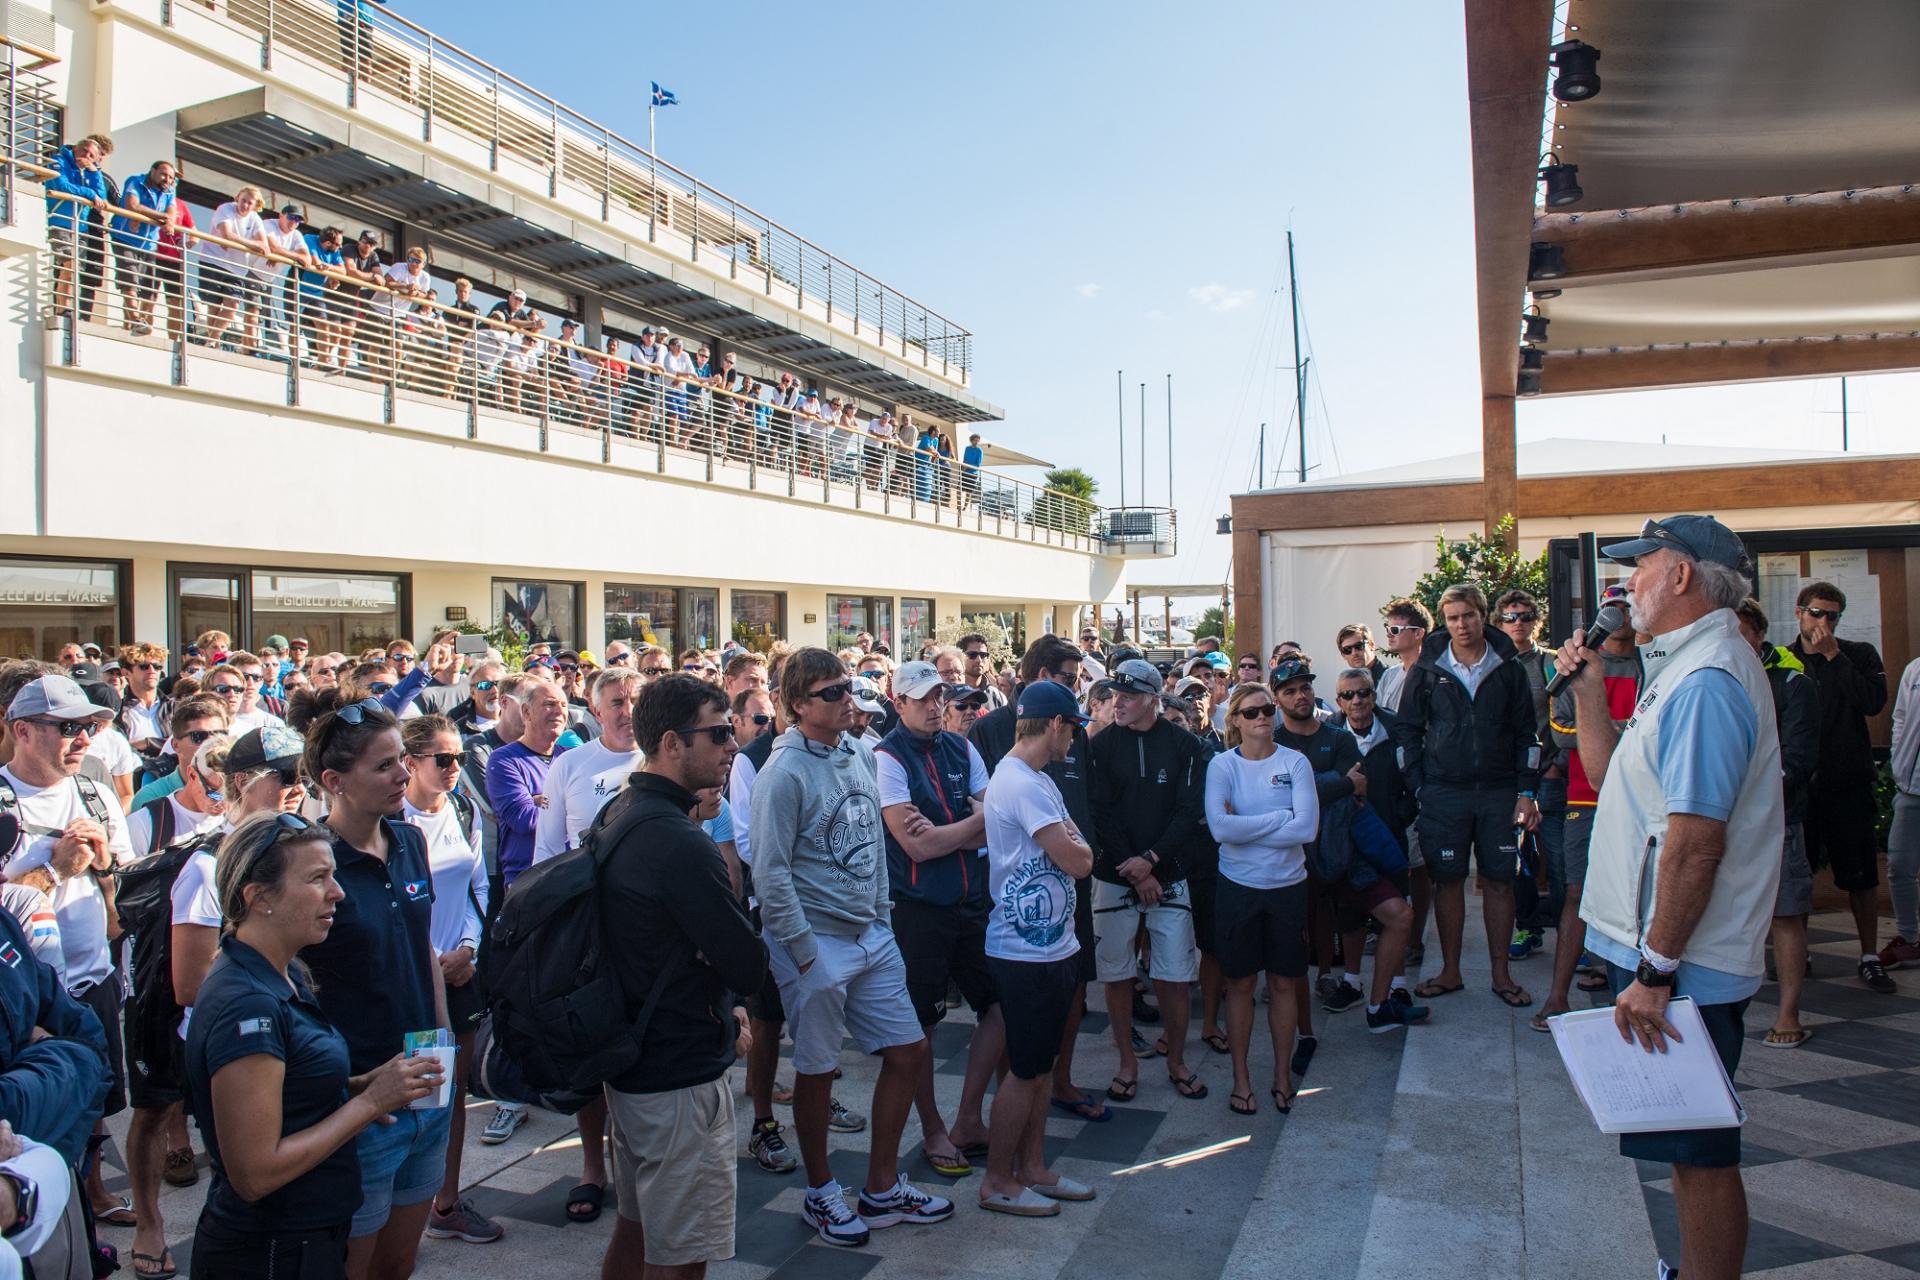 Audi J/70 World Championship: Teasing Mistral - NEWS - Yacht Club Costa Smeralda